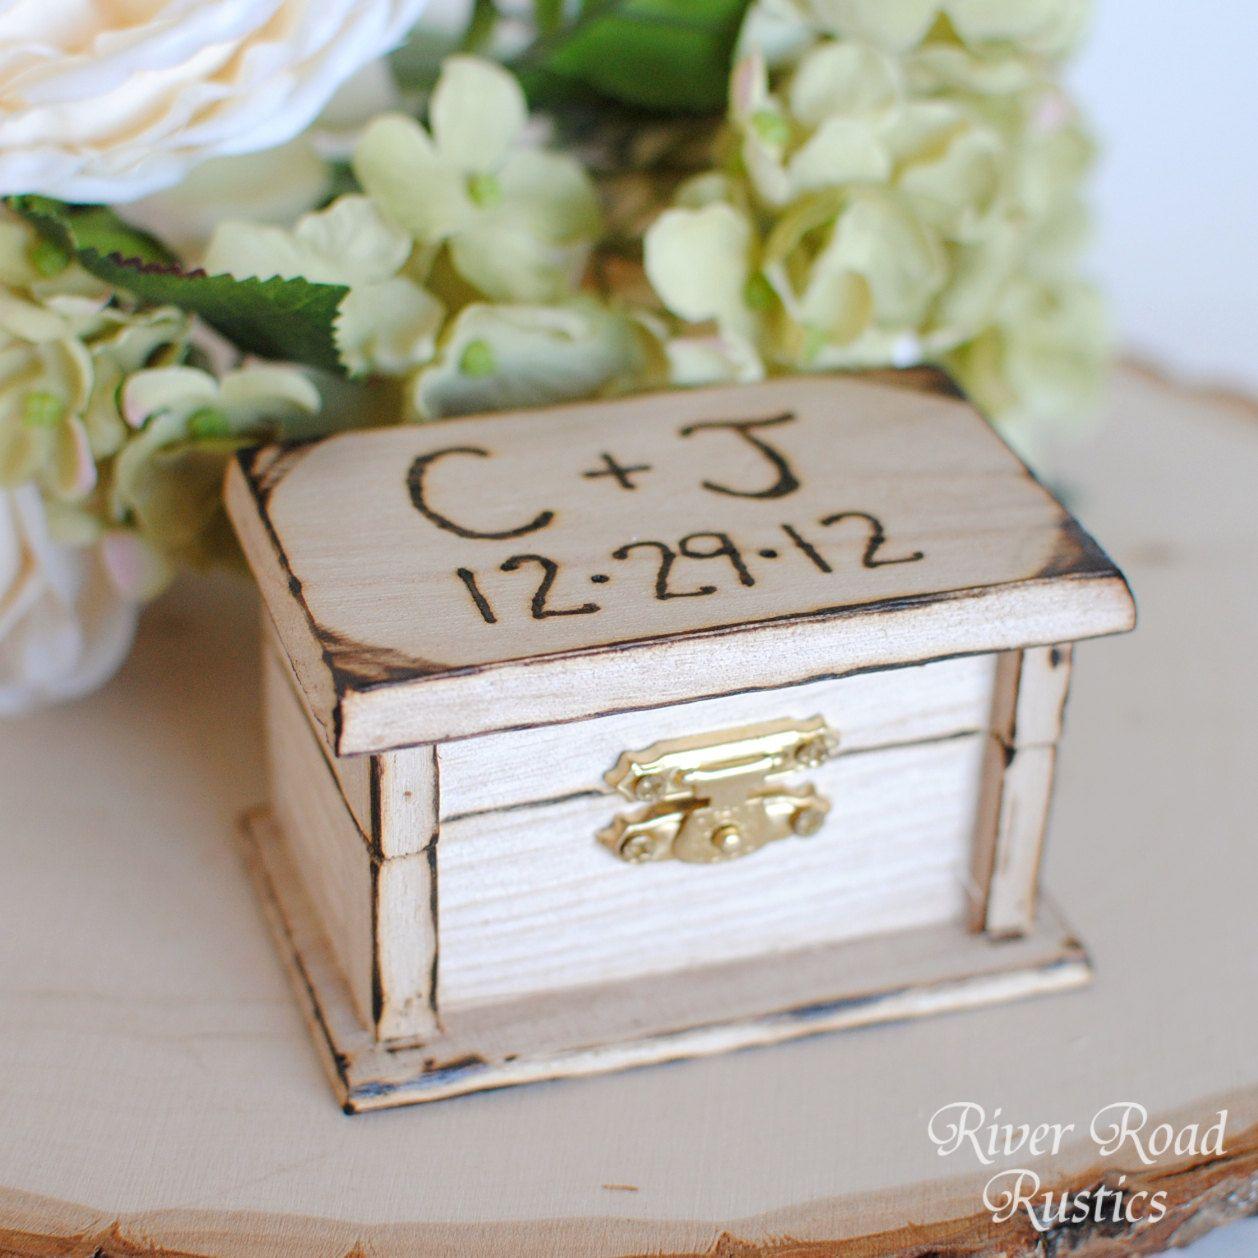 Petite rustic wedding ring box keepsake or ring bearer box petite rustic wedding ring box keepsake or ring bearer box personalized comes with burlap pillow junglespirit Images